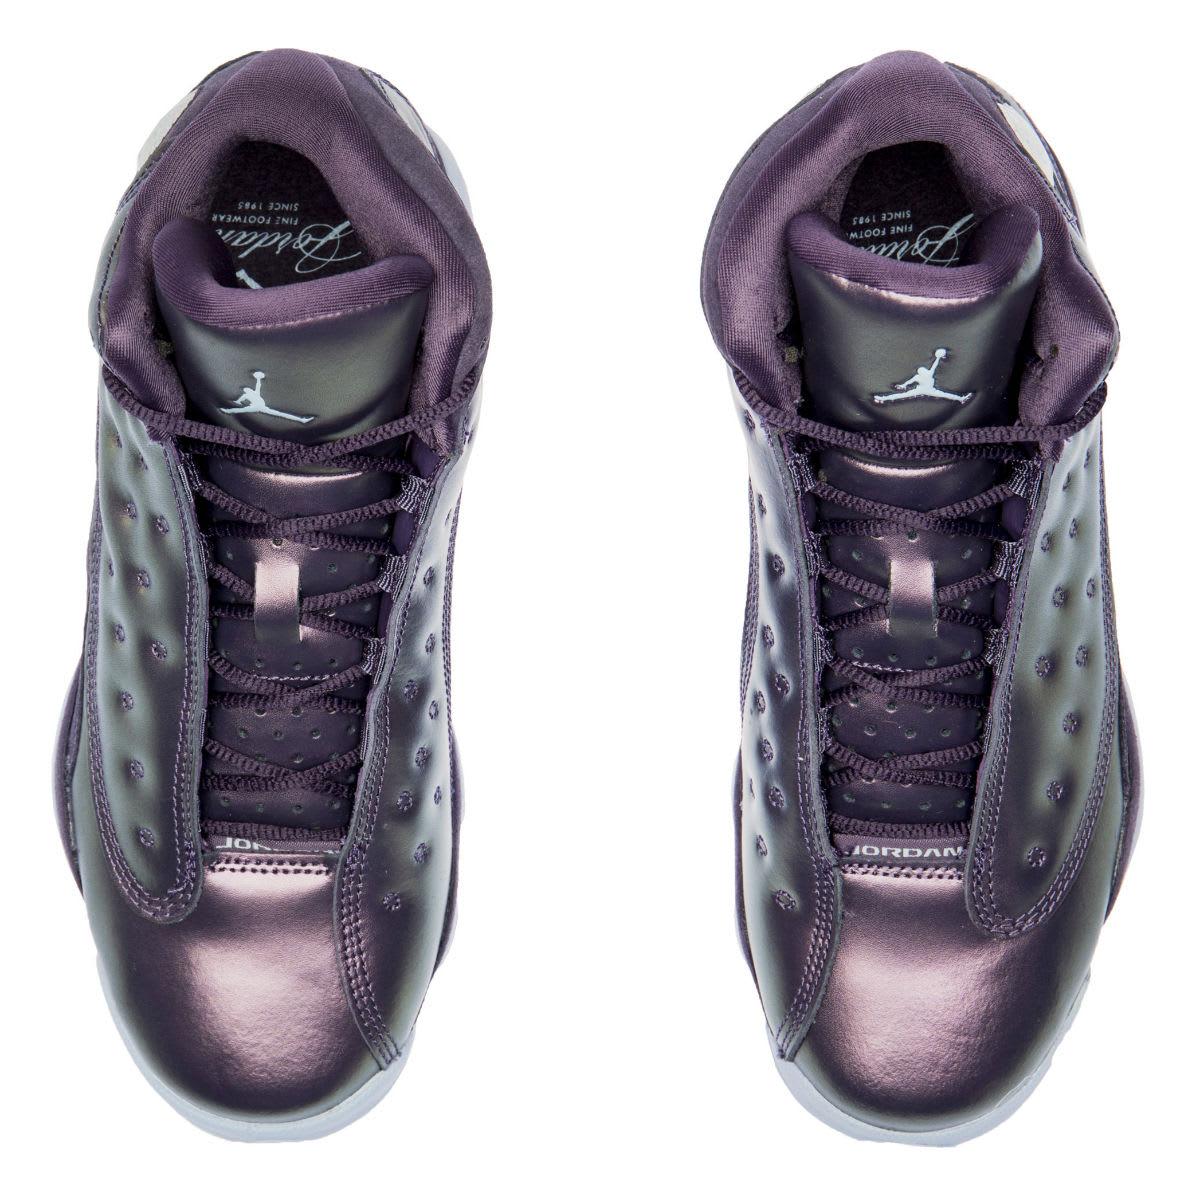 Air Jordan 13 XIII HC Dark Raisin Release Date AA1236-520 Top